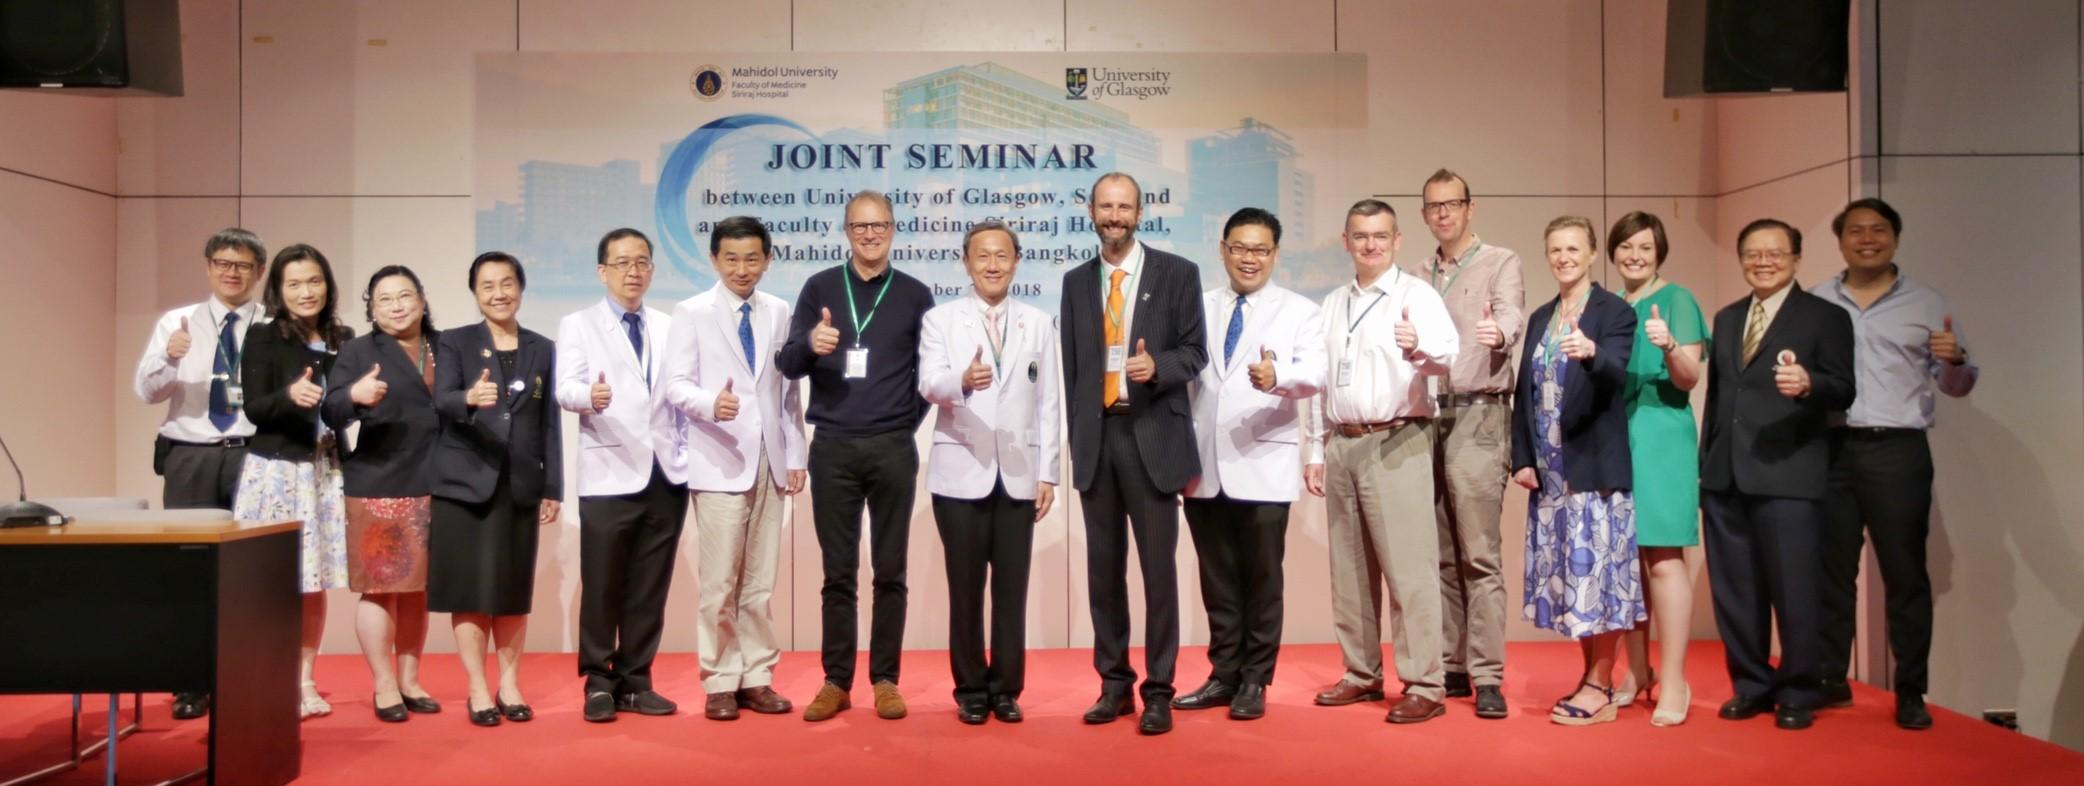 Joint Seminar between University of Glasgow and Siriraj